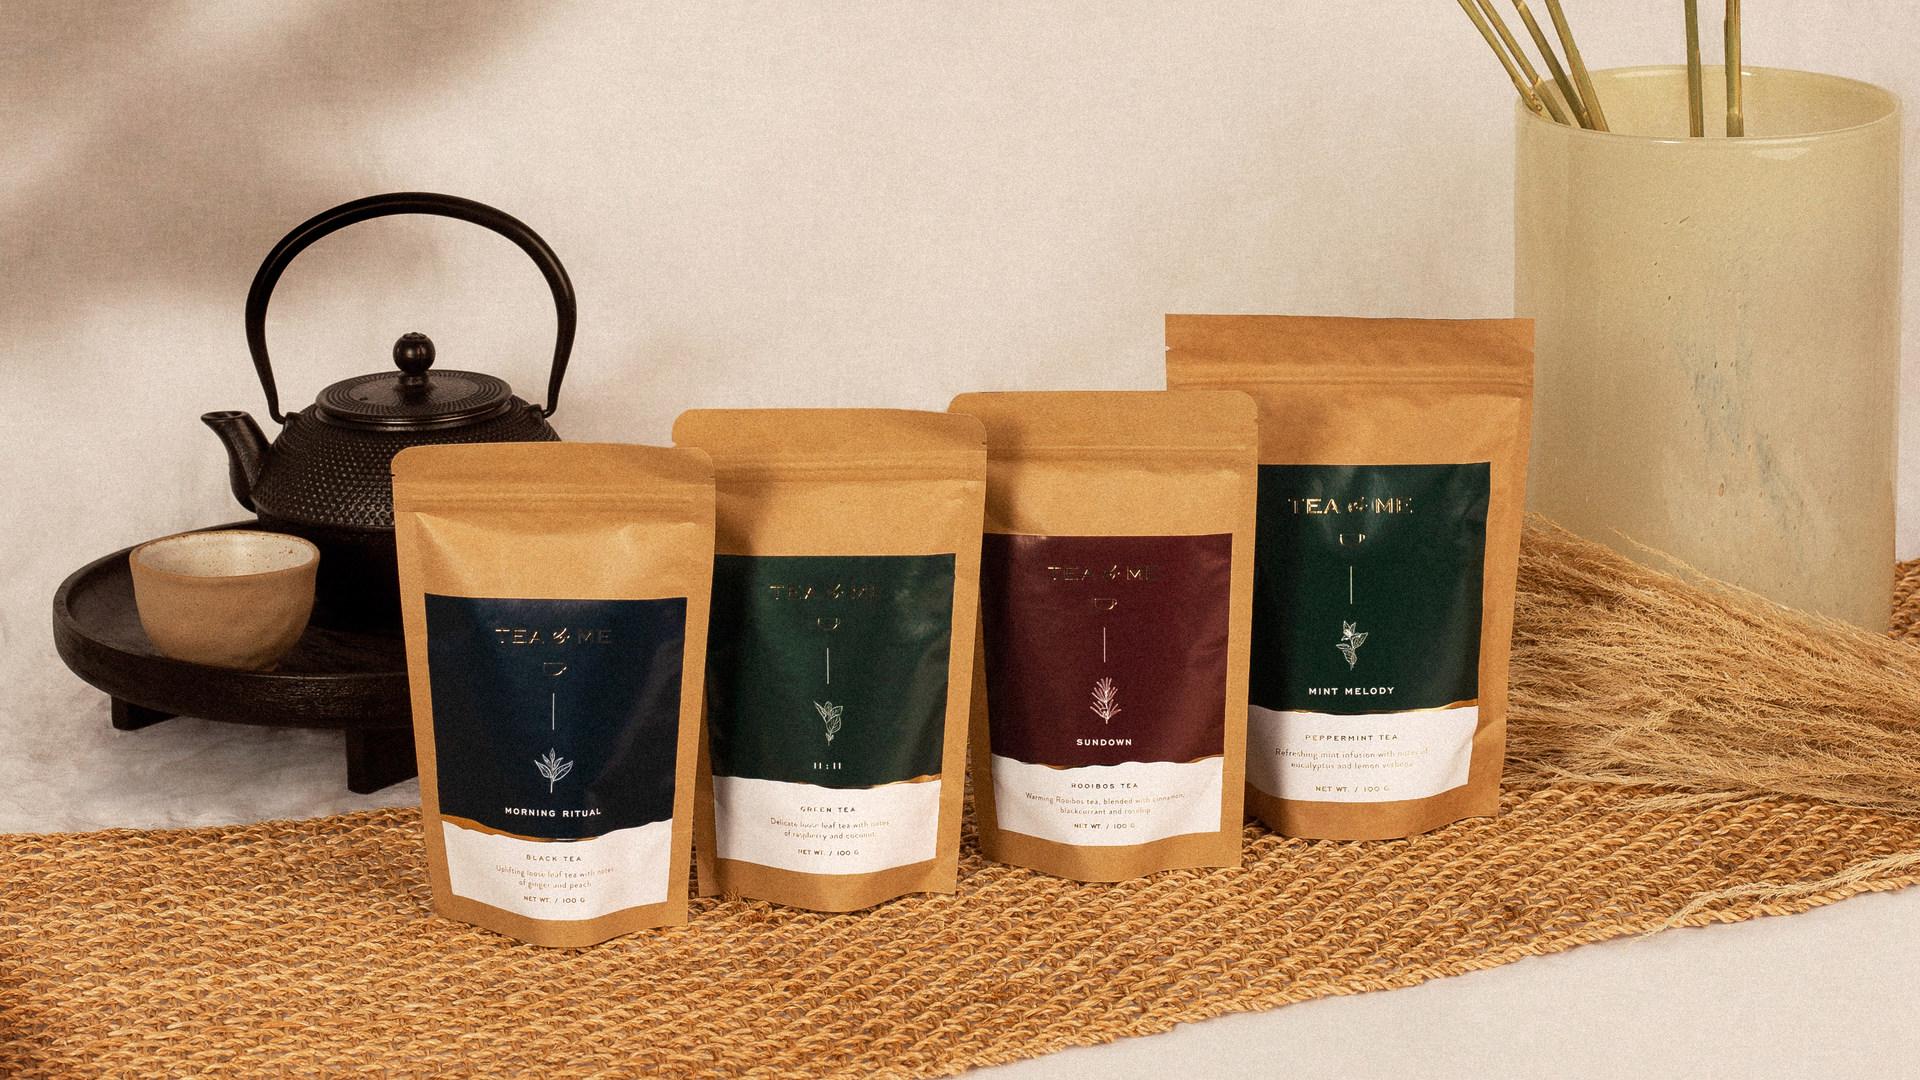 Tea&Me is a London-based company of organic, loose-leaf teas.